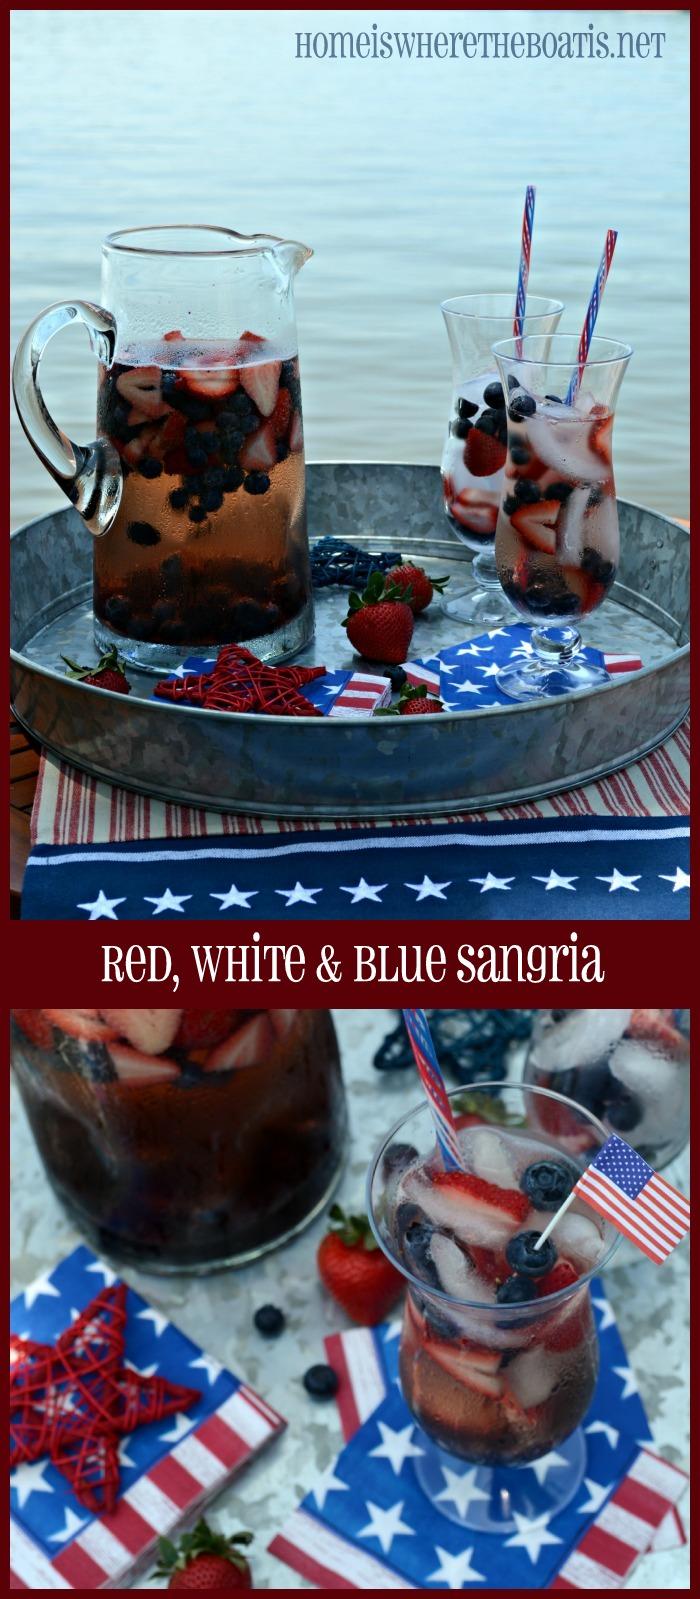 Red, White & Blue Sangria